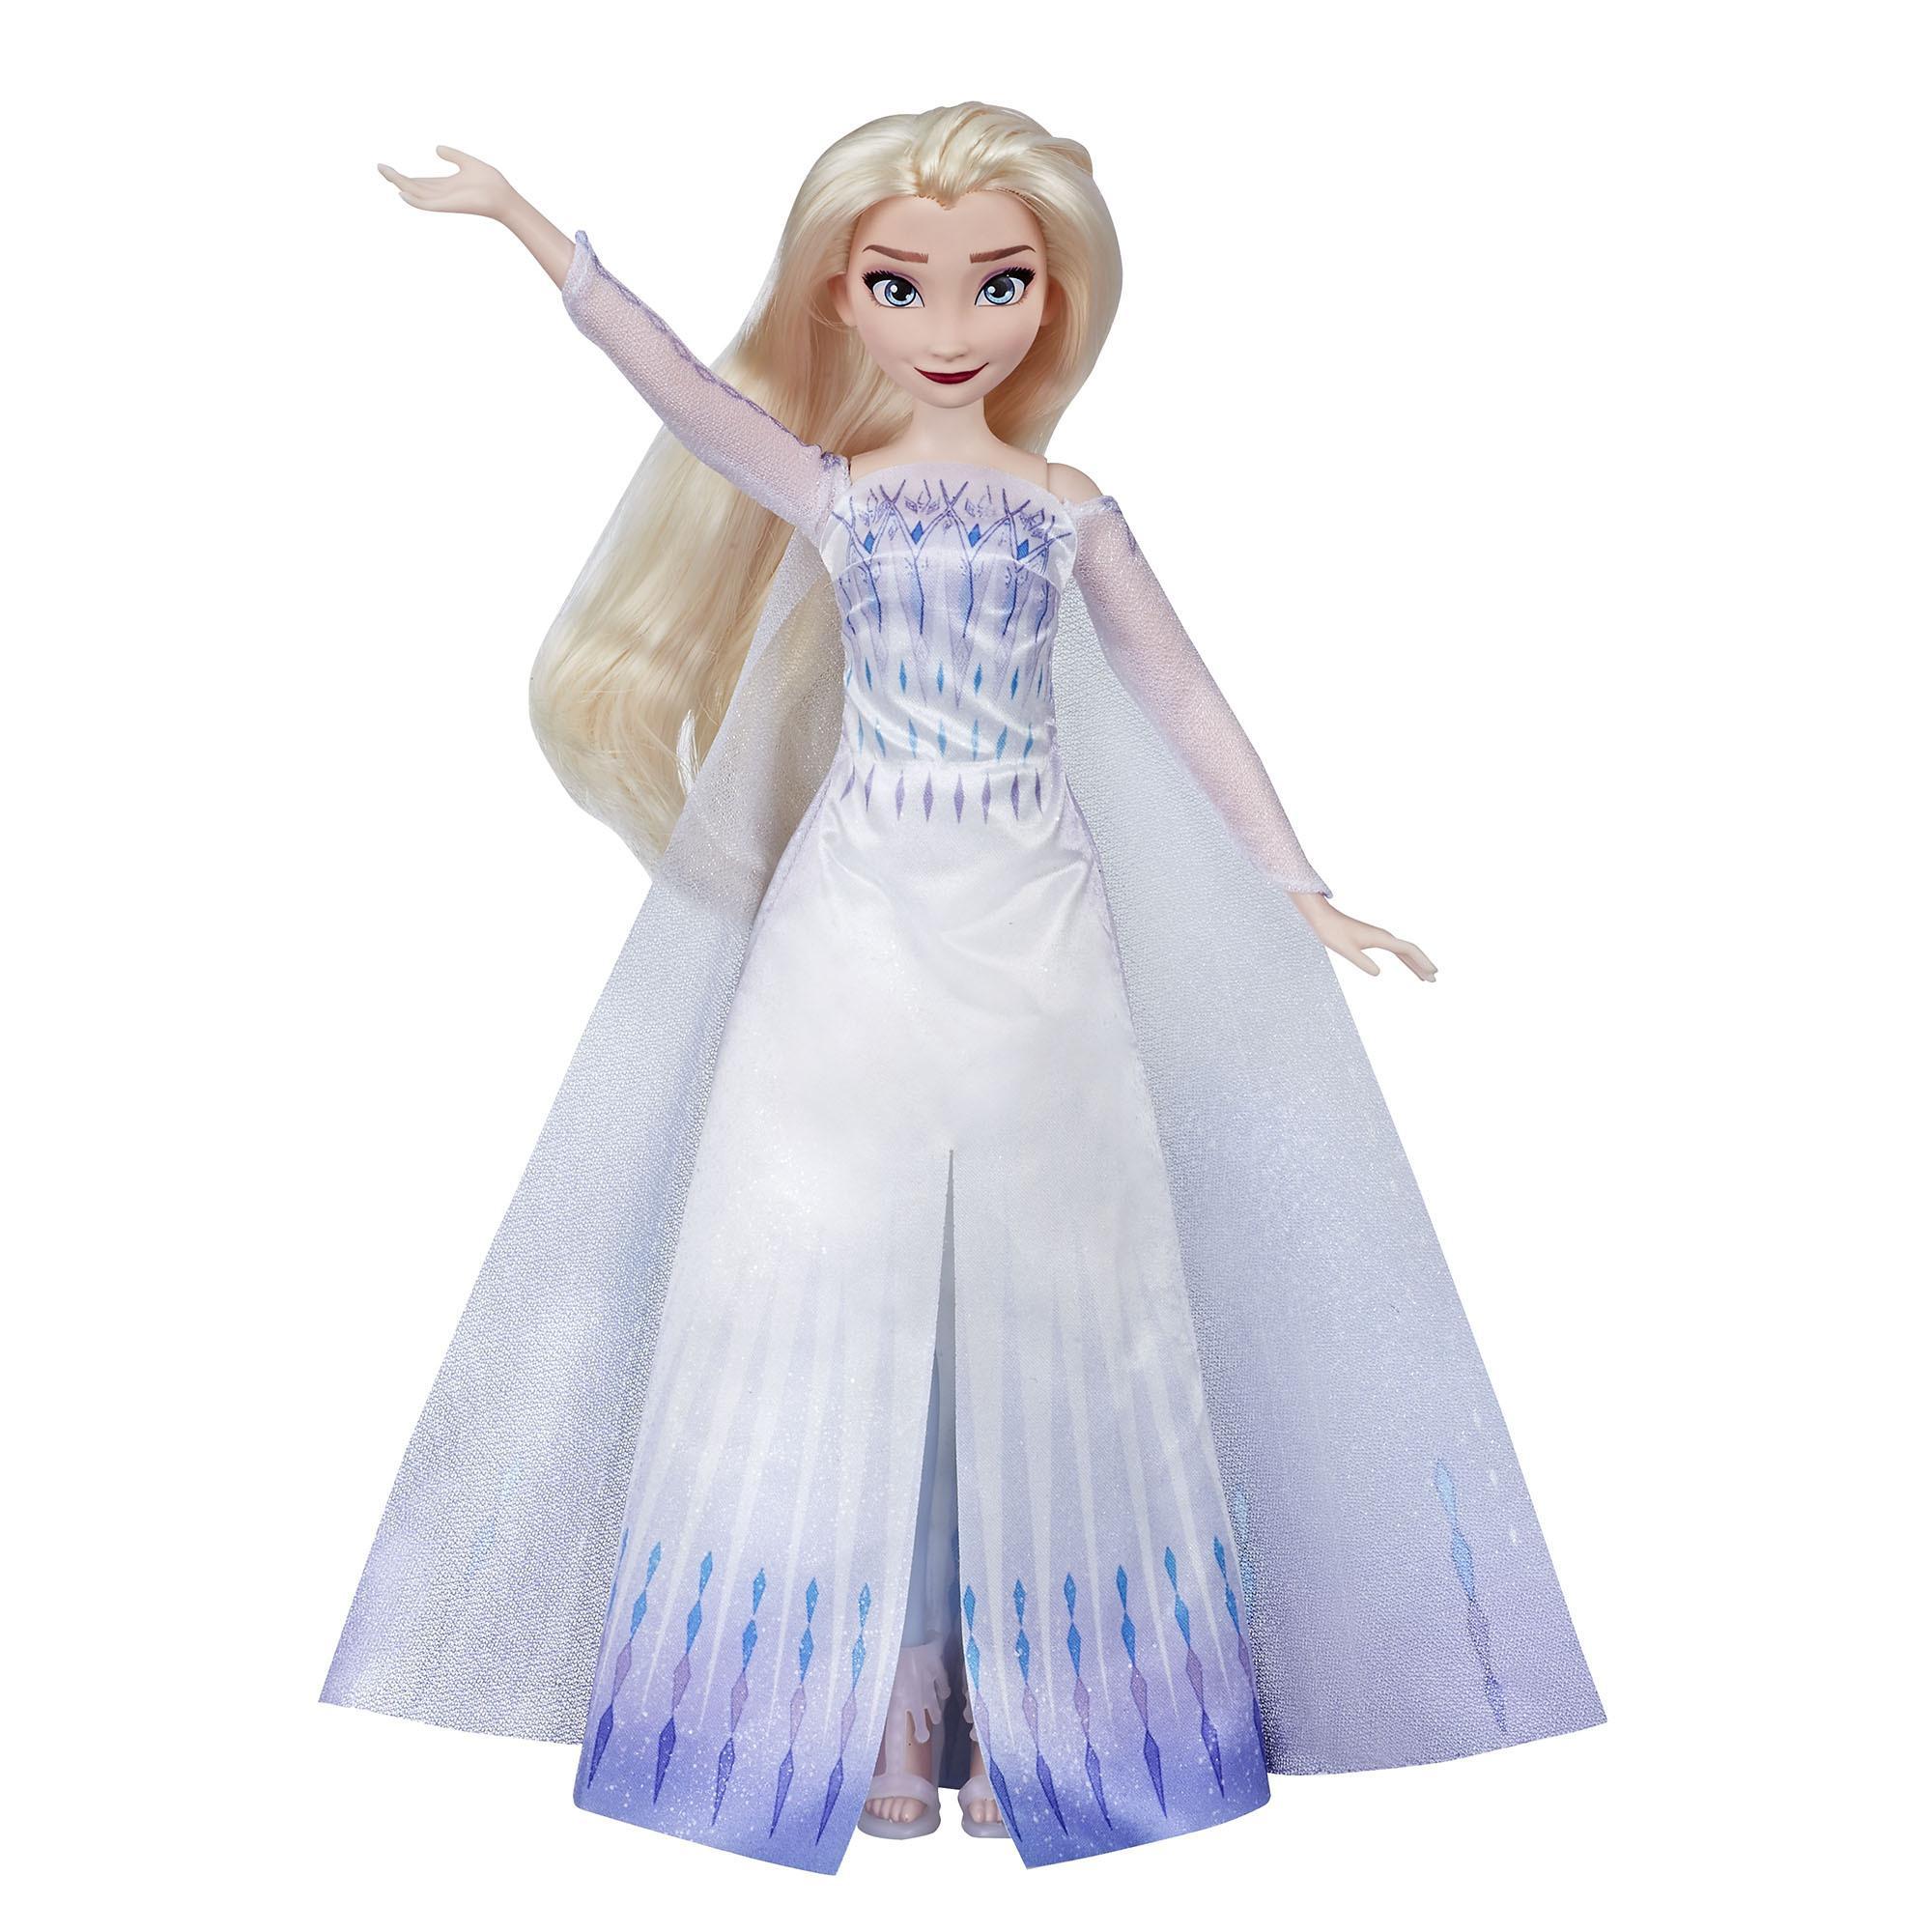 "Disney Frozen Musical Adventure Elsa Singing Doll, Sjunger ""Show Yourself"" från Disney-filmen Frost 2"